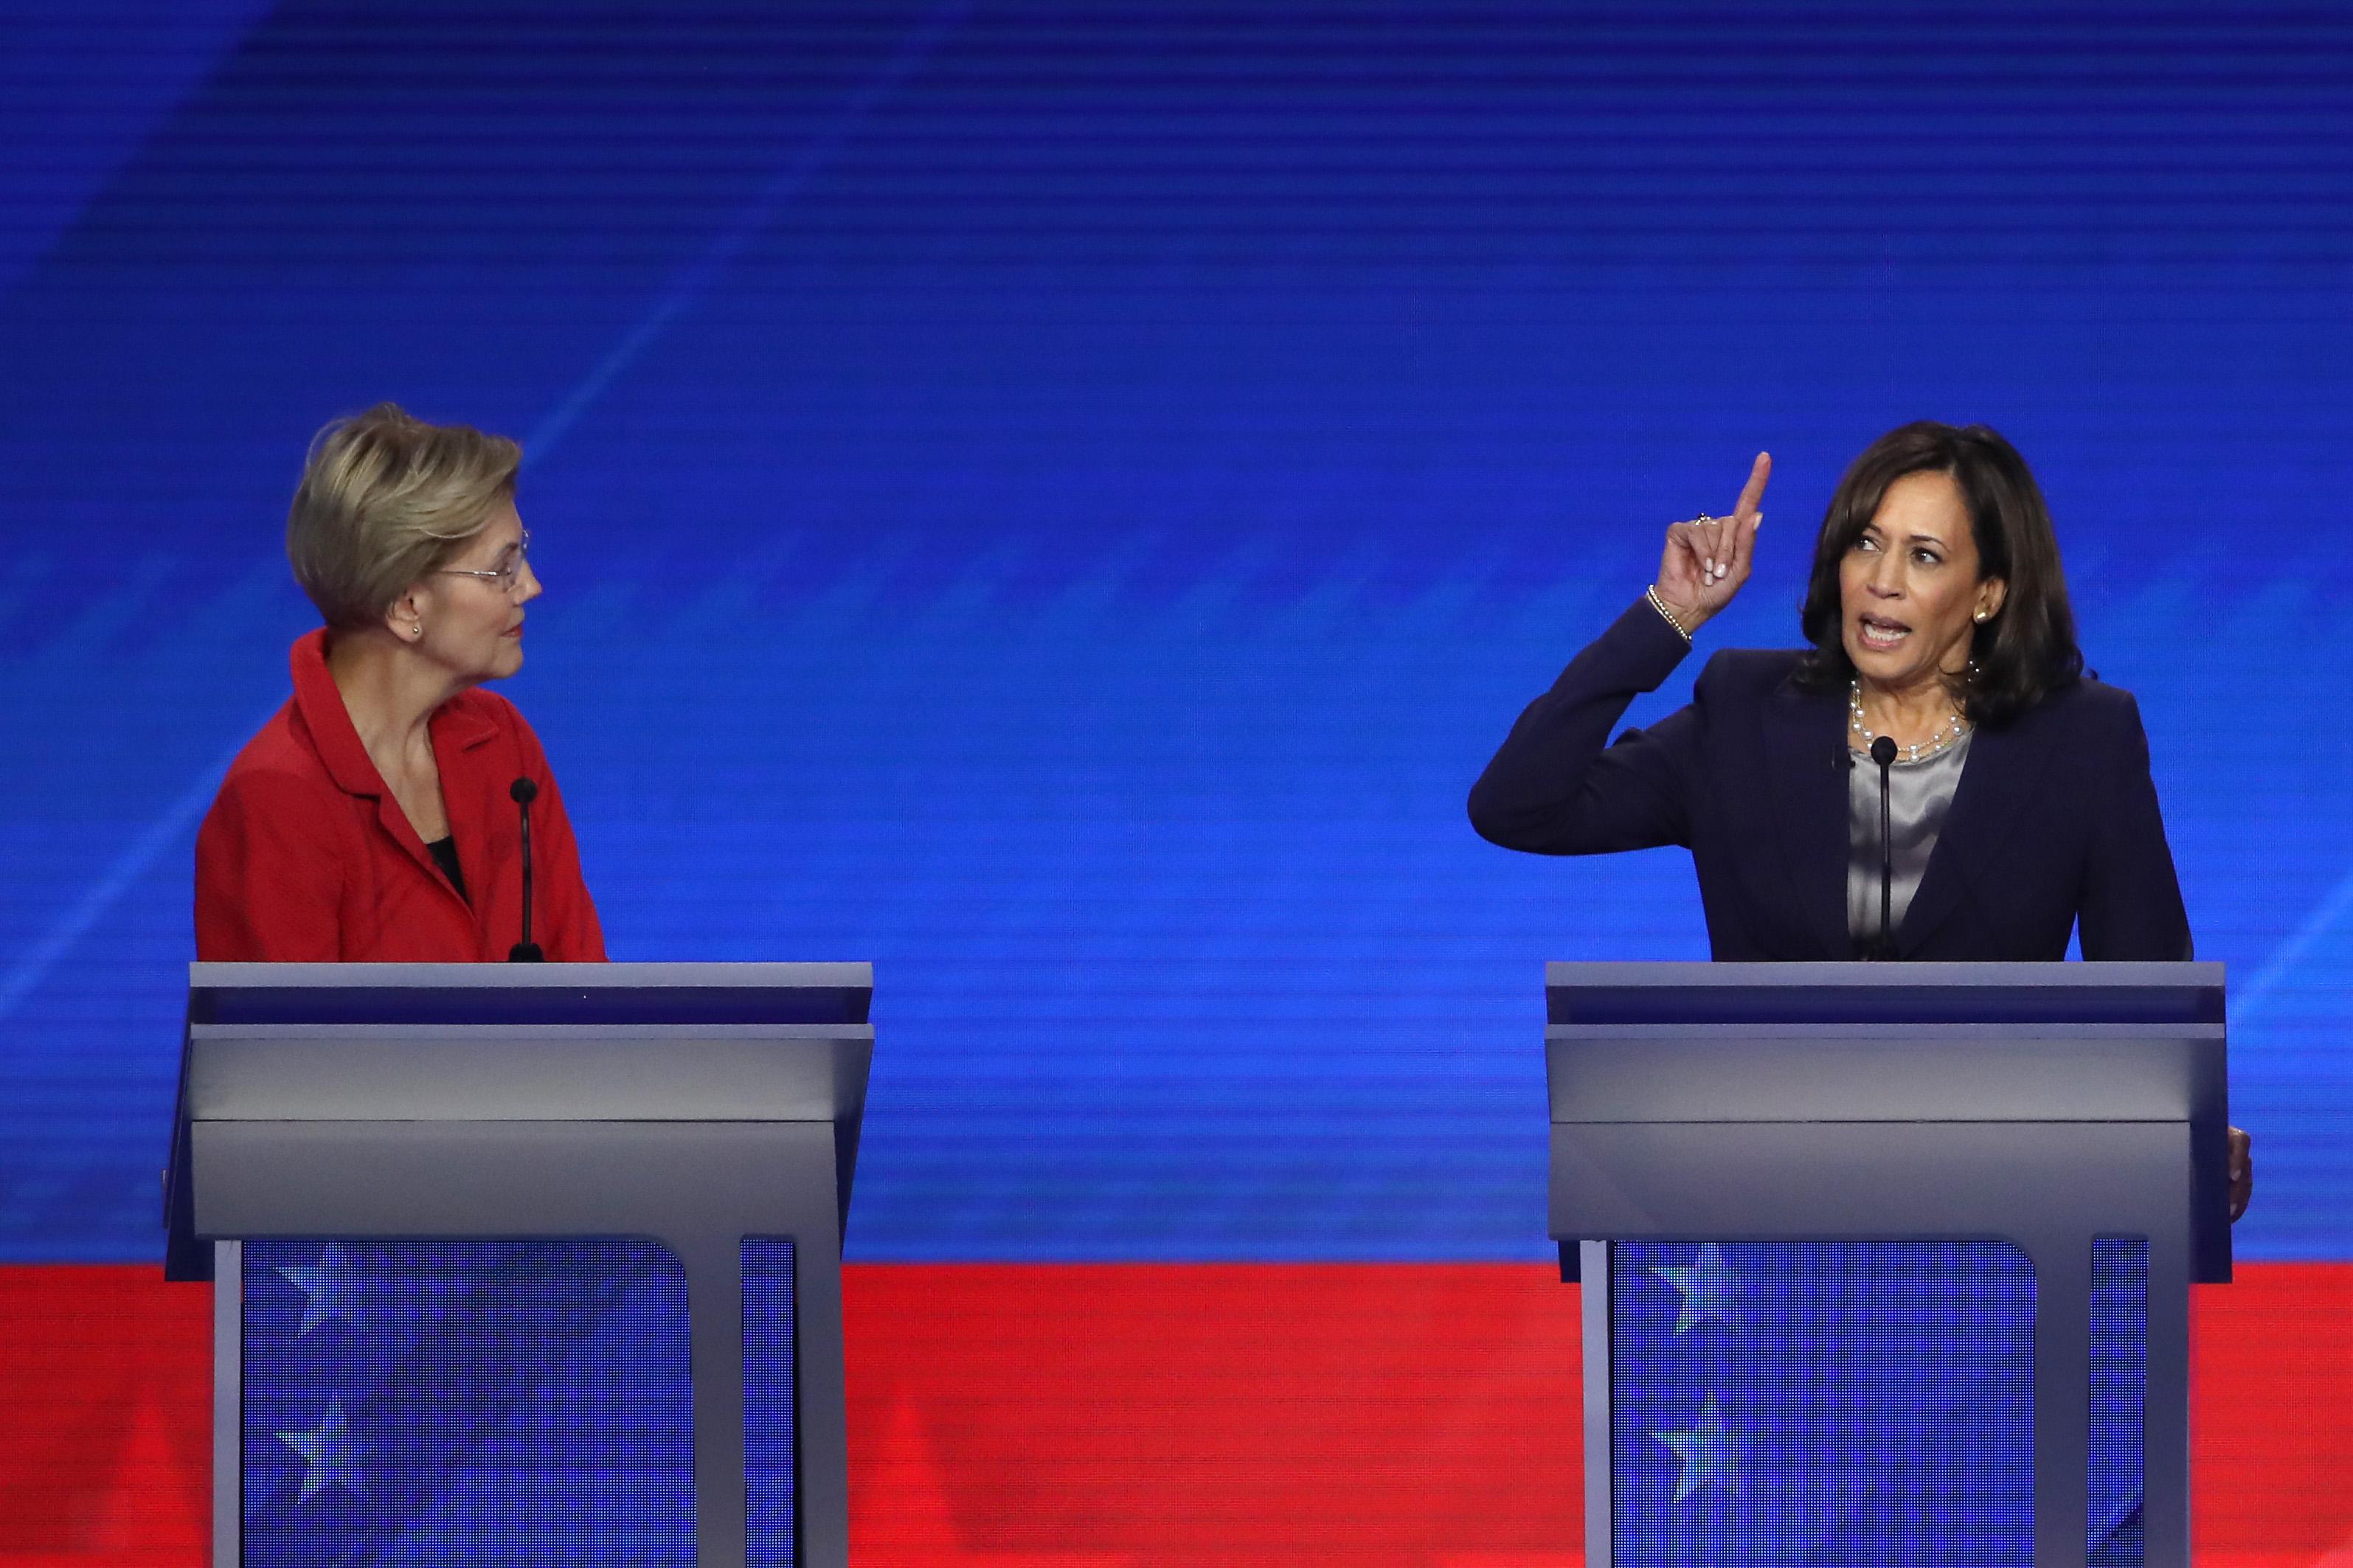 Elizabeth Warren and Kamala Harris at their podiums at the fourth Democratic debate.